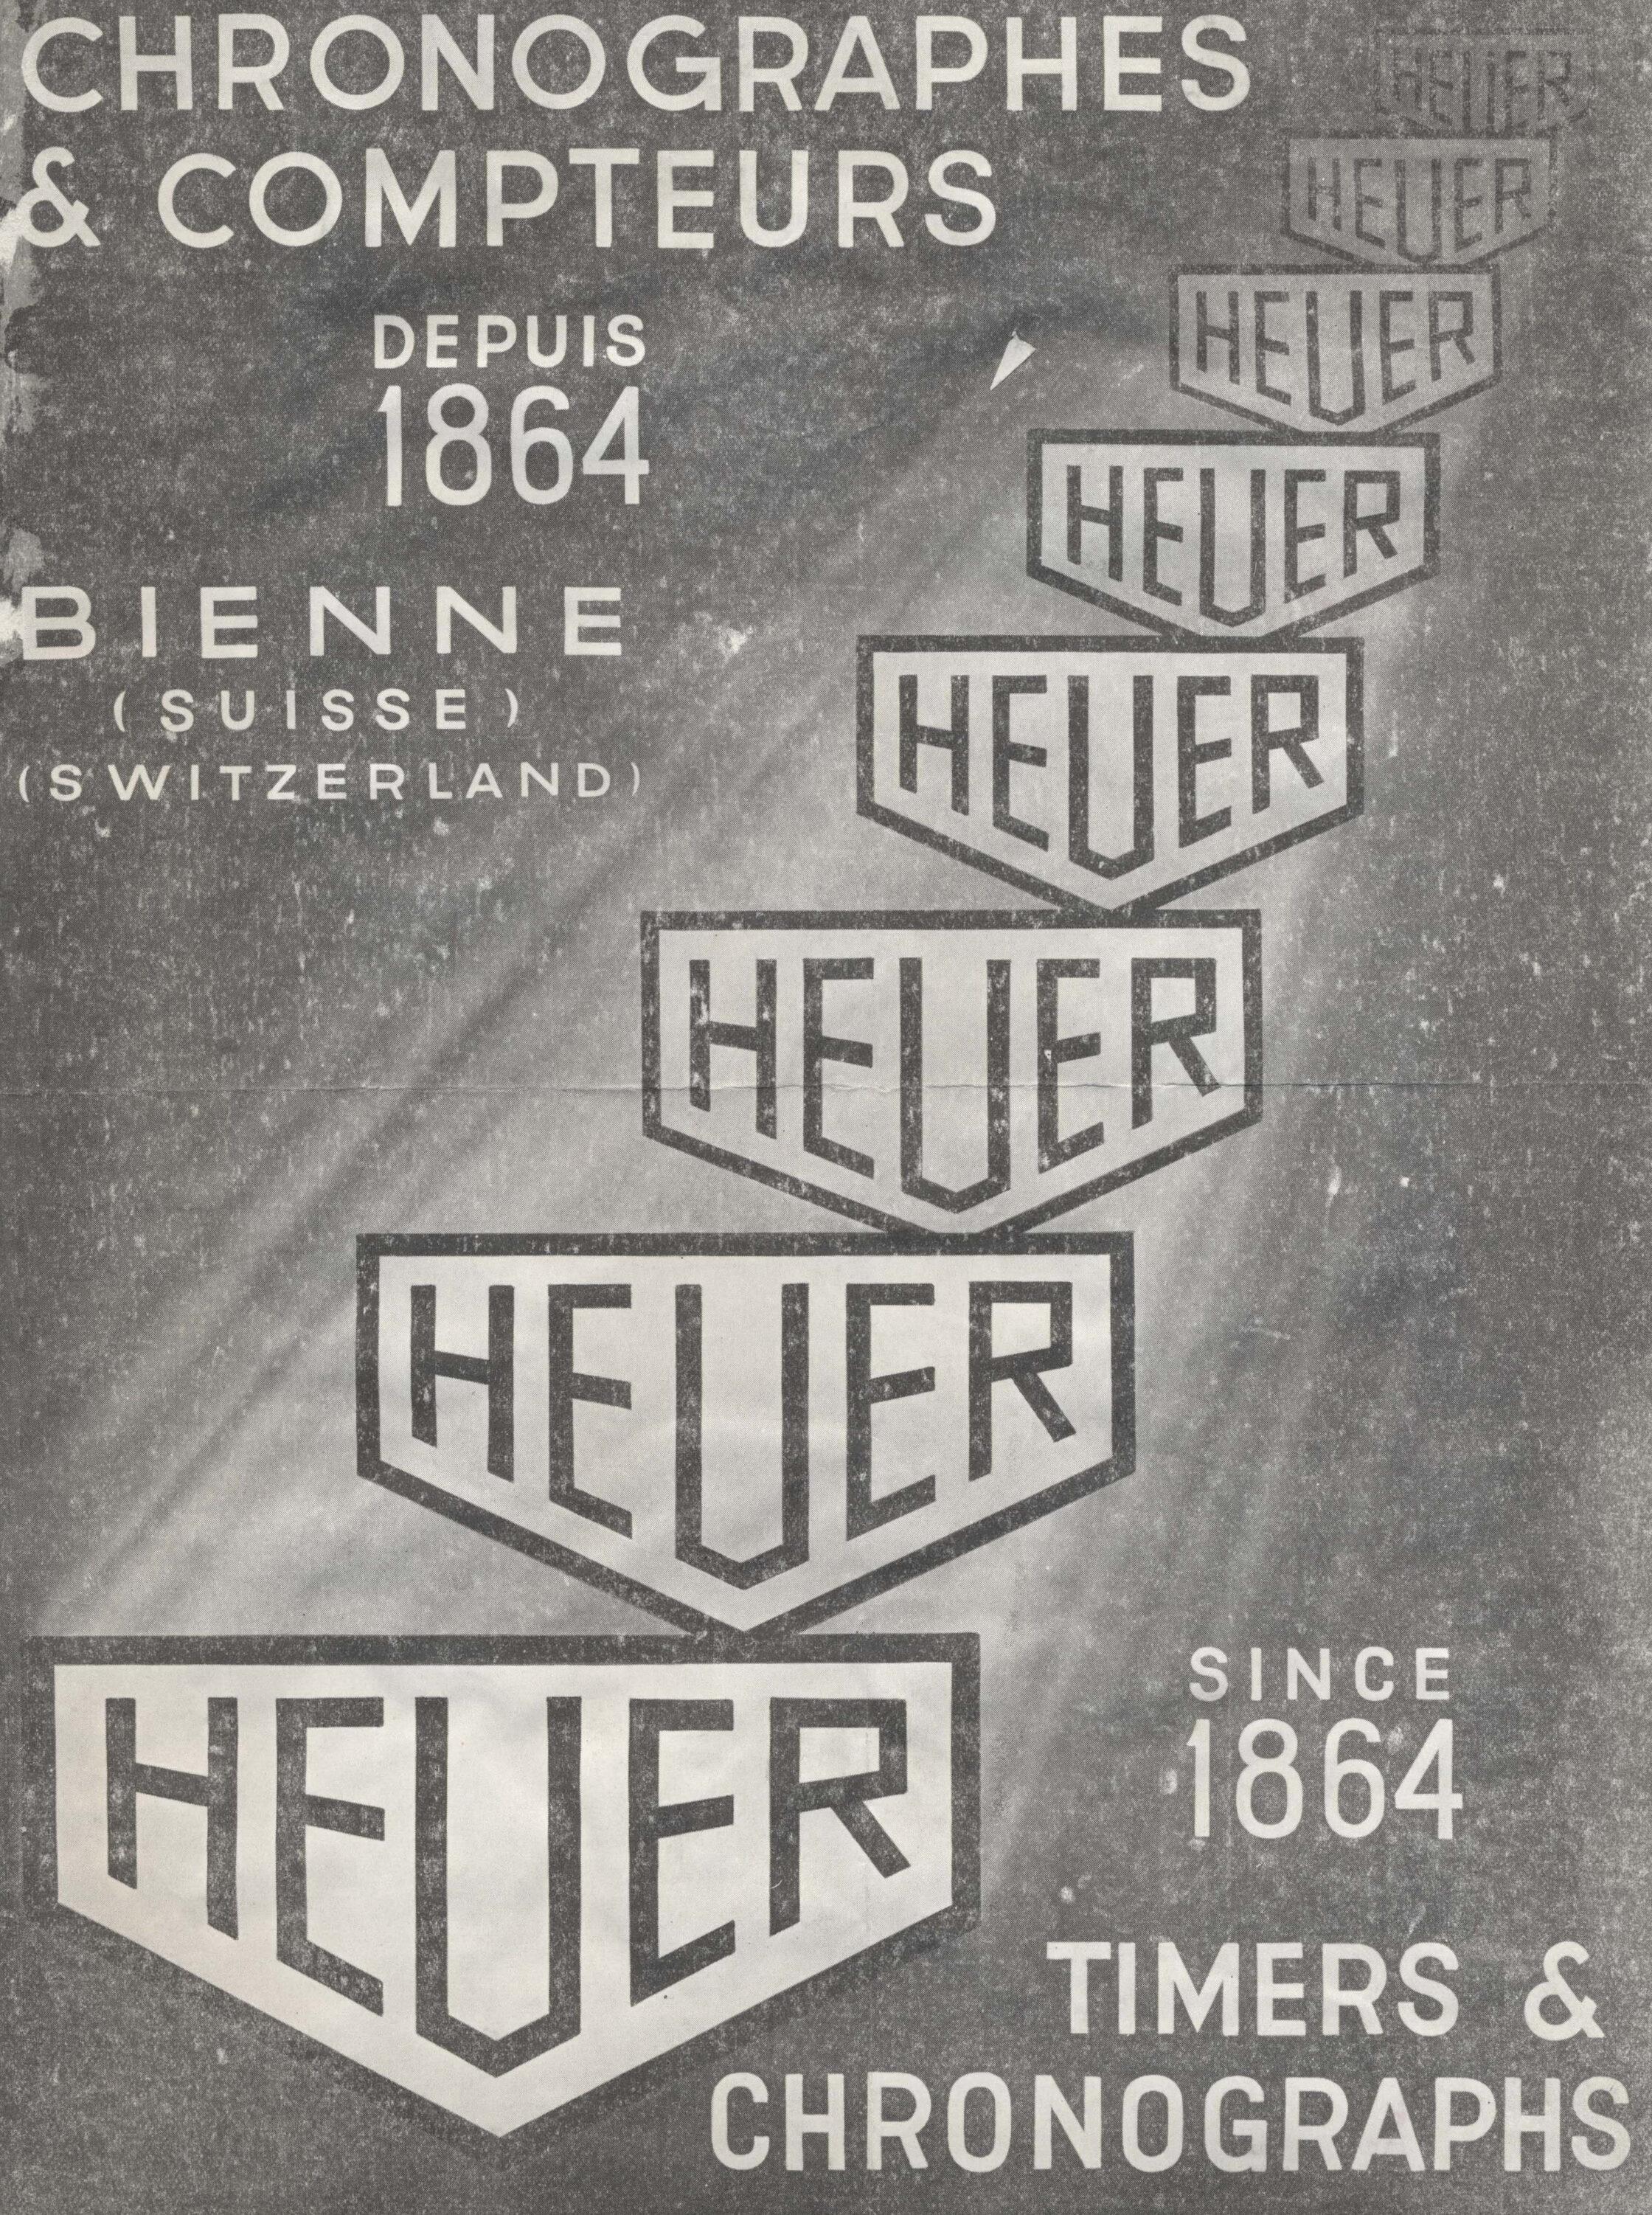 Heuer advert from 1936